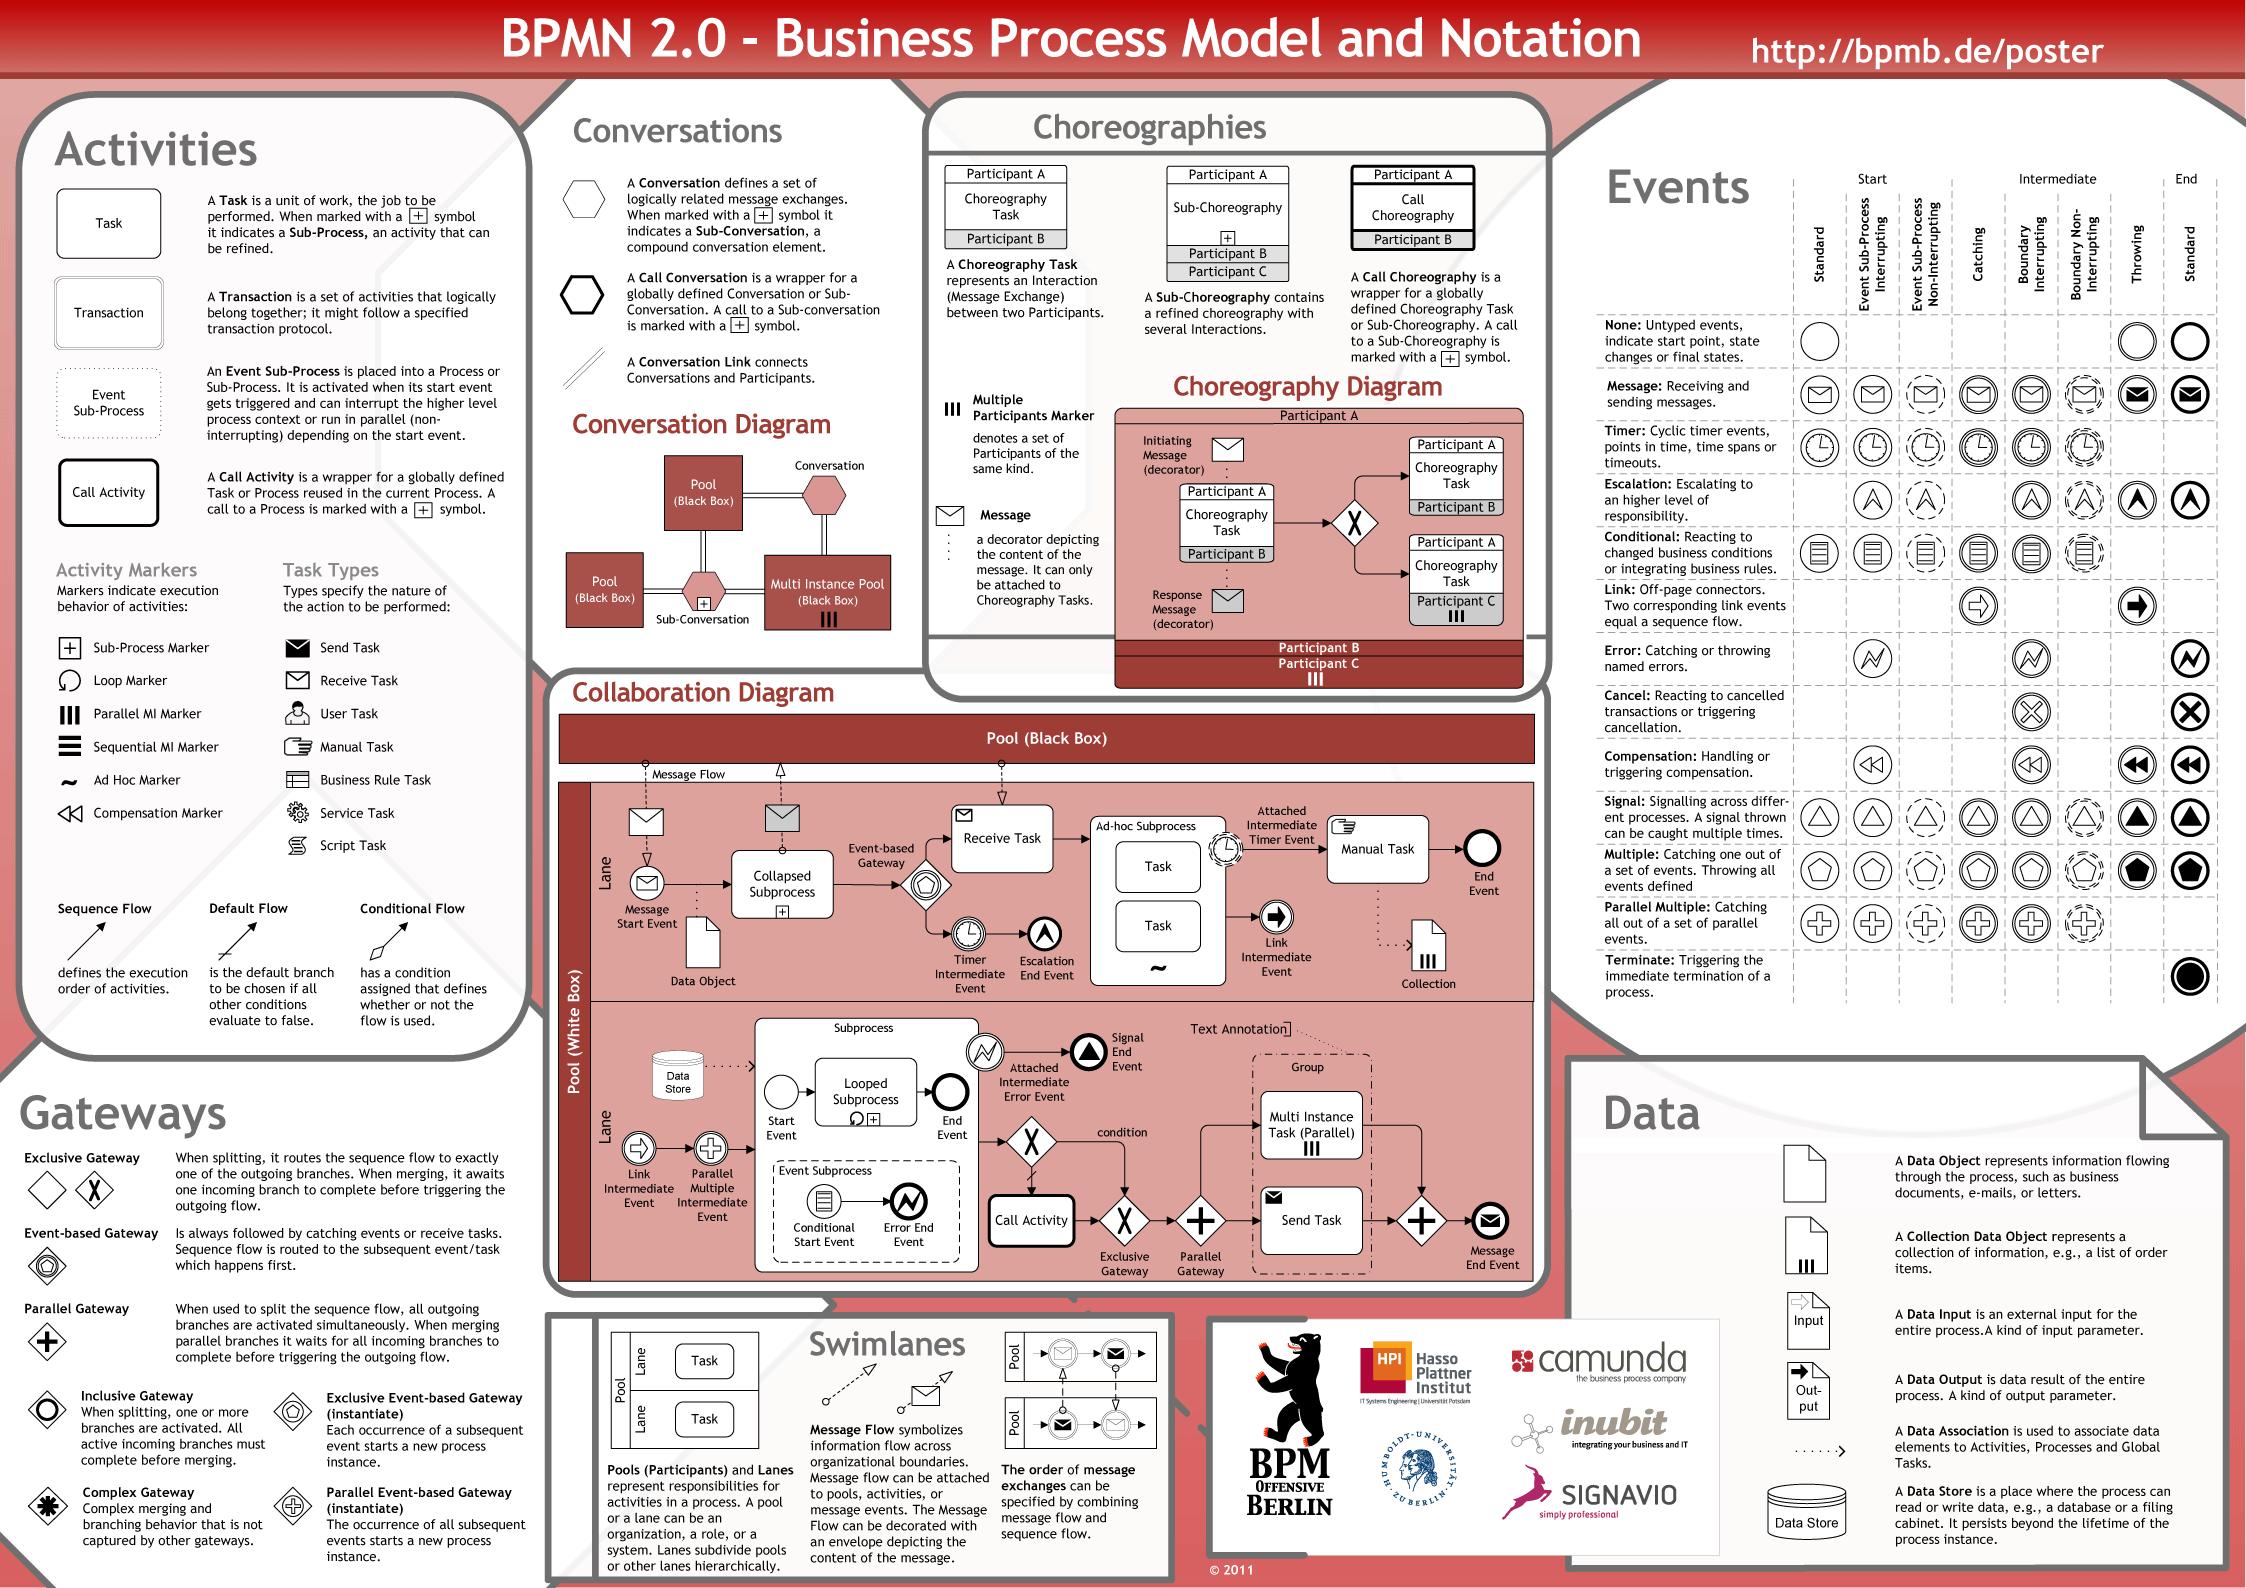 bpmn 2.0 pdf